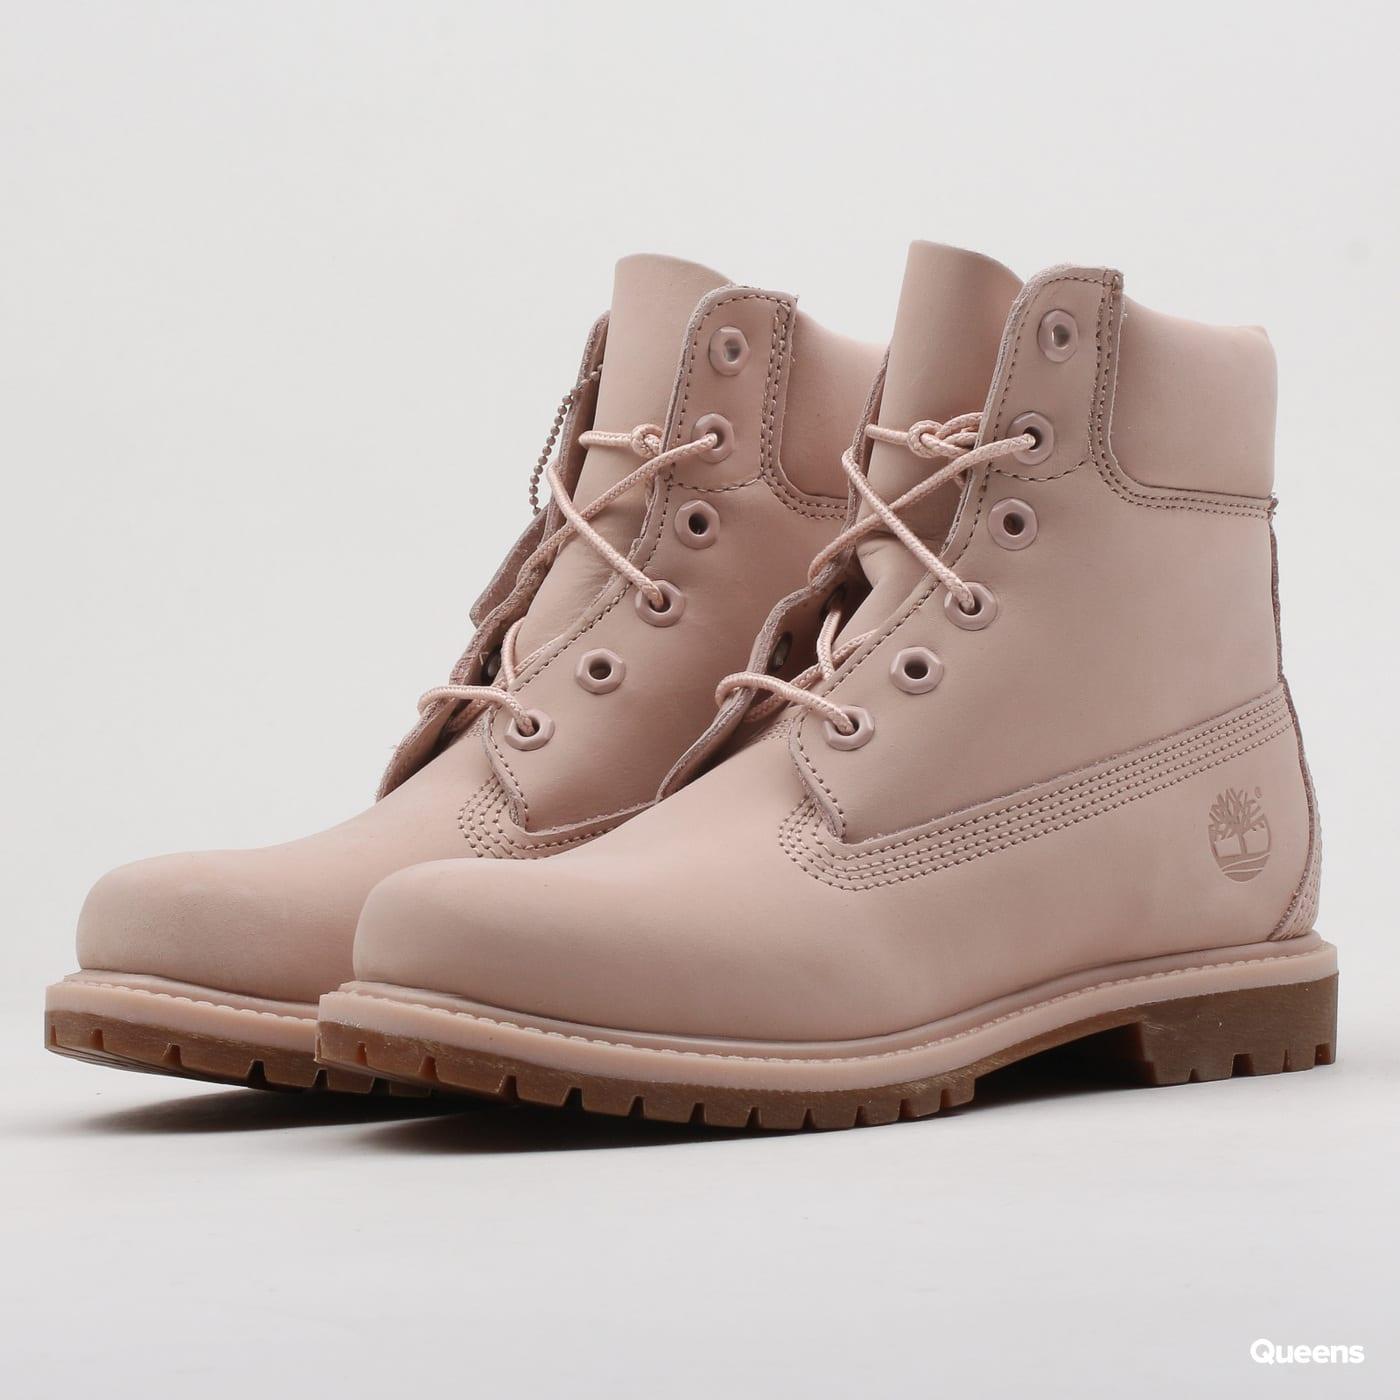 Pánska zimná obuv Timberland 6 In Premium Boot - W (A1K3Z-PNK)– Queens 💚 3f110b4736c